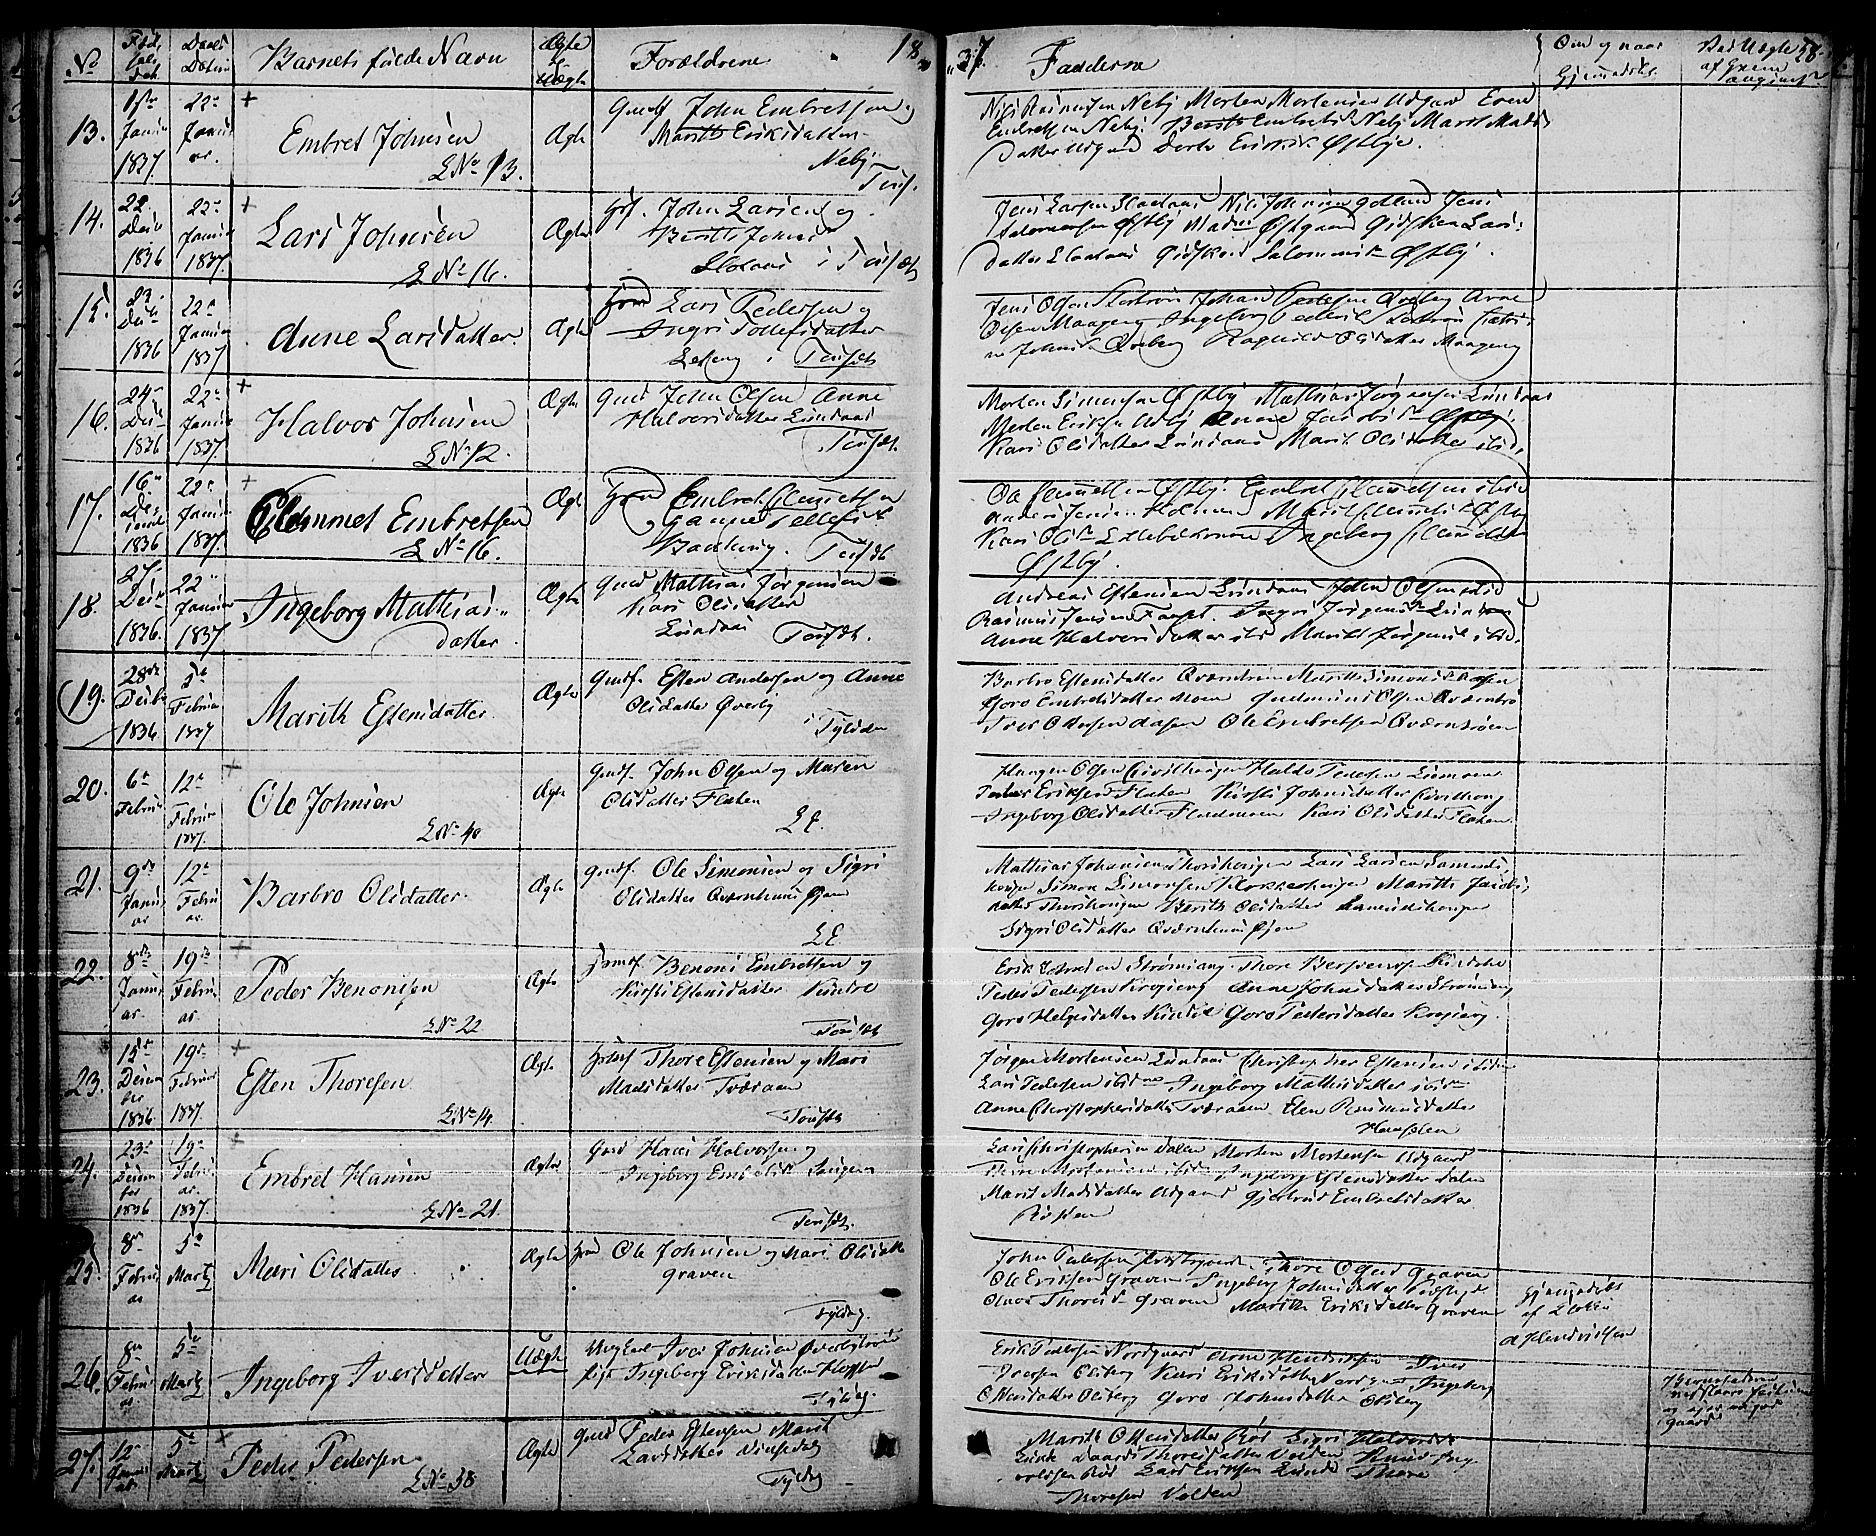 SAH, Tynset prestekontor, Ministerialbok nr. 19, 1829-1847, s. 58